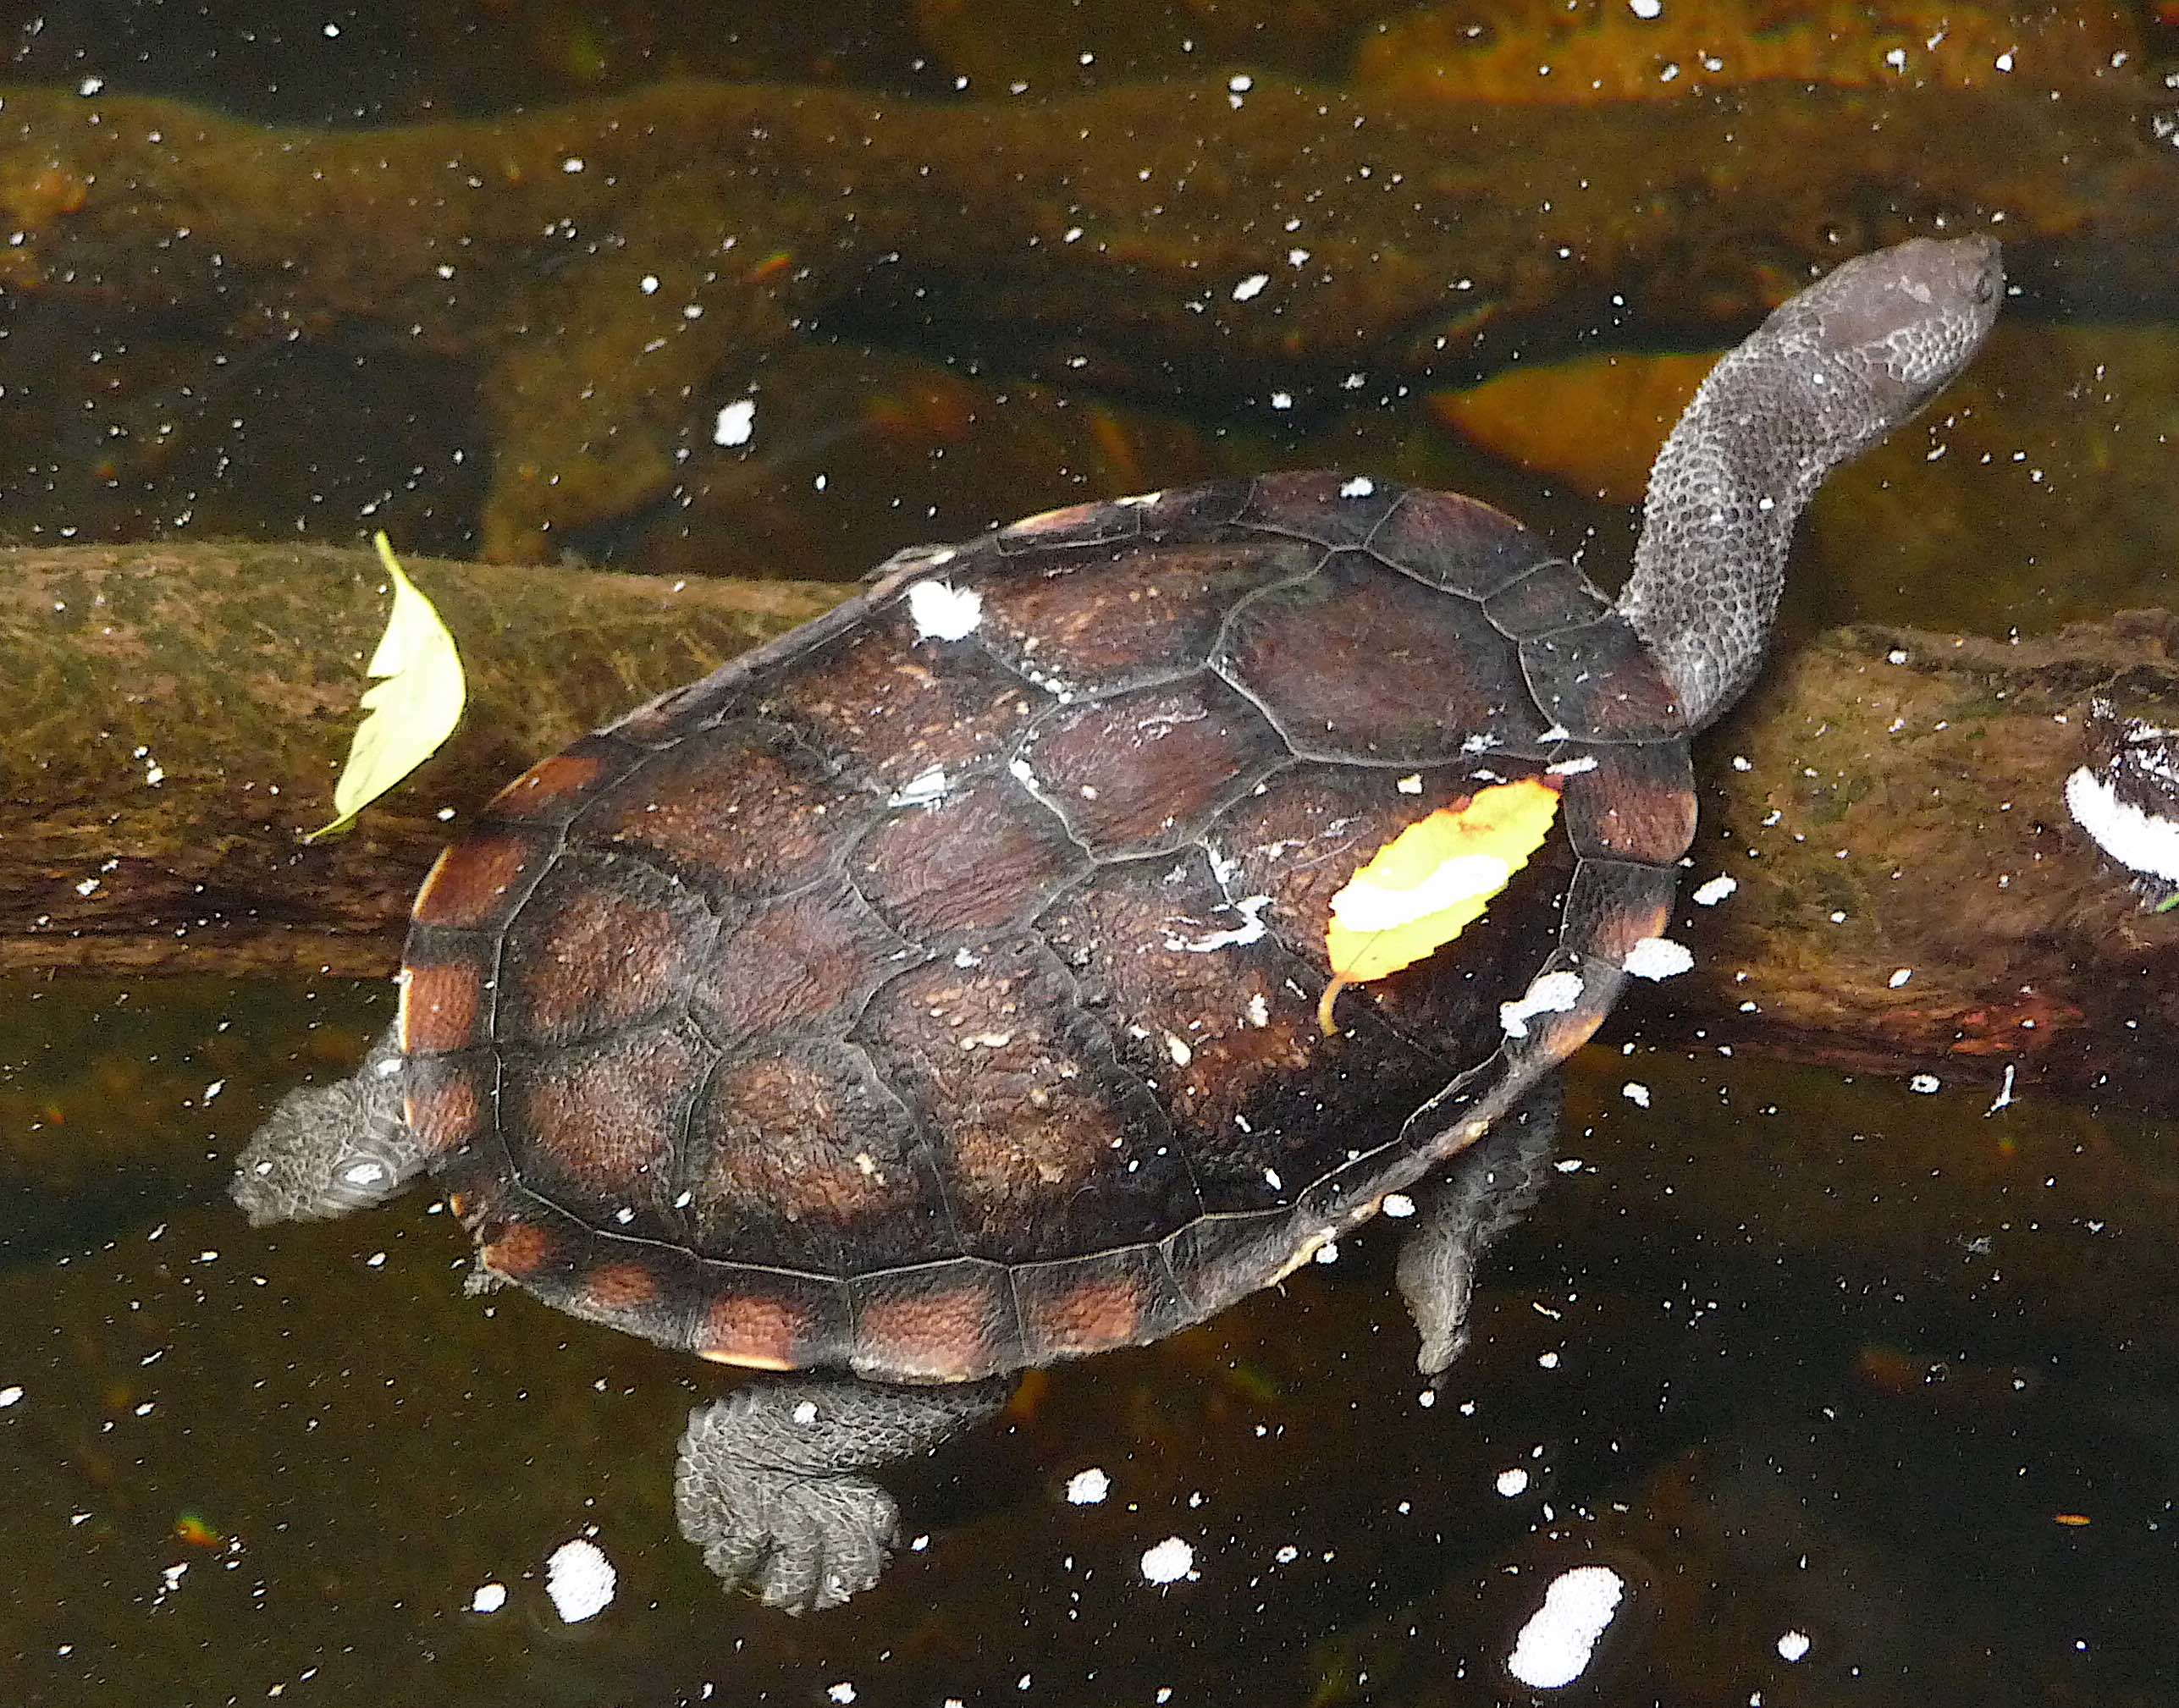 51.Eastern snake-necked turtle